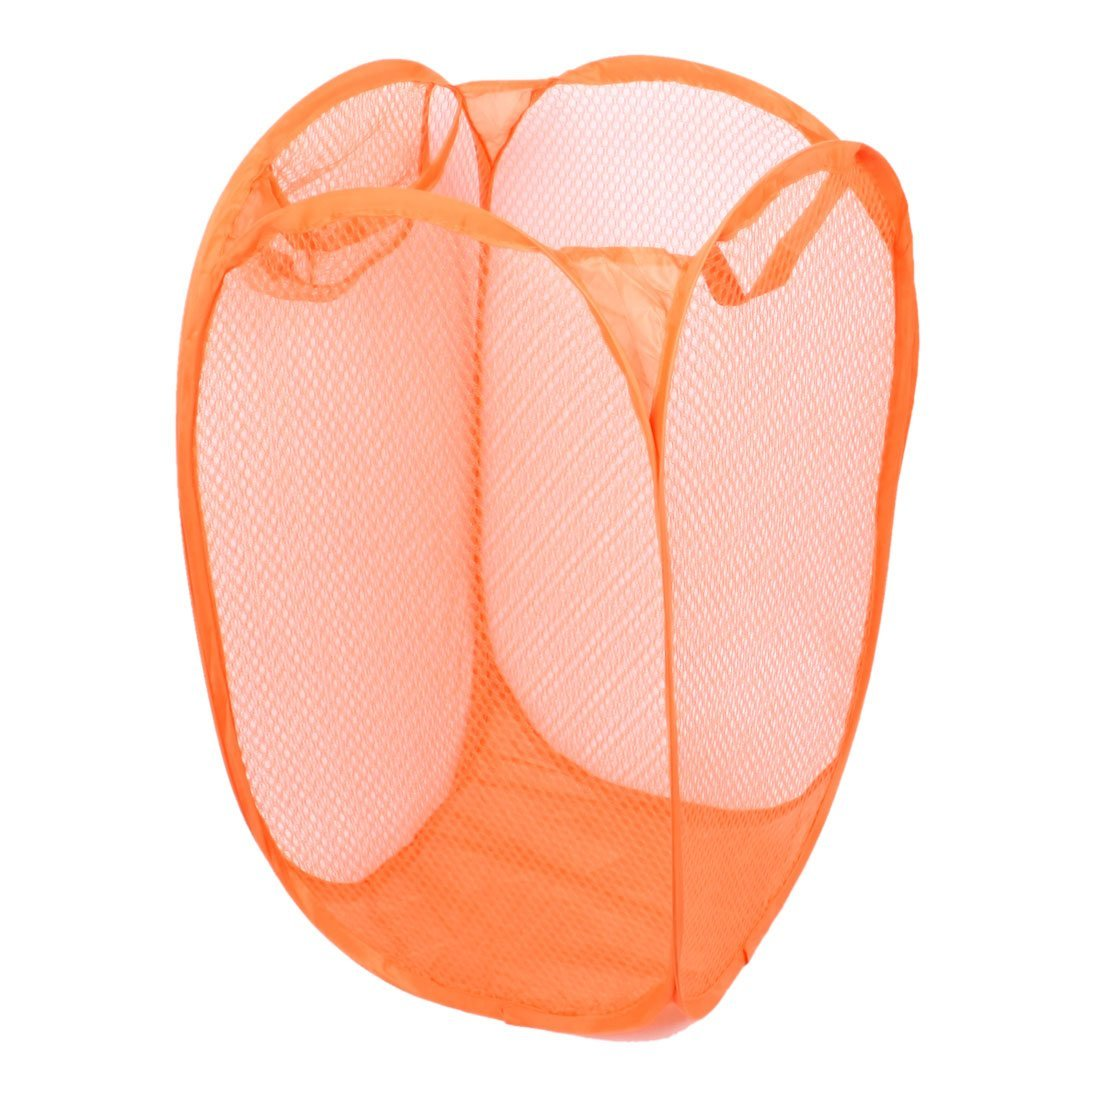 SODIAL/£/¨R/£/©Hogar Sucio Ropas Lavanderia Plegable Bolsa de Malla Canasta Soporte Naranja